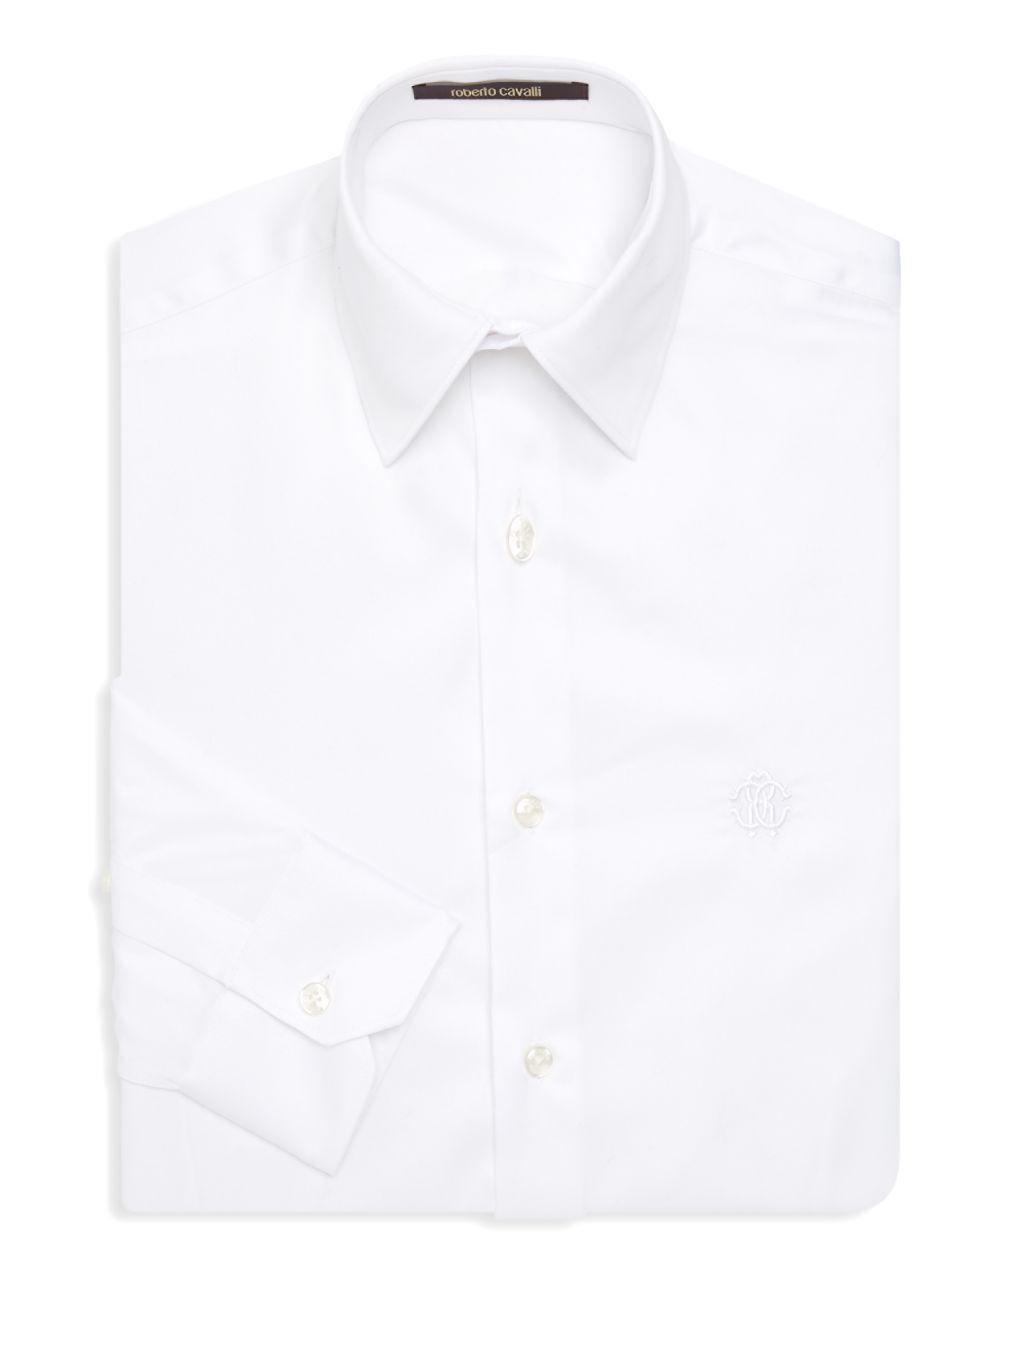 Roberto Cavalli Logo Embroidered Dress Shirt